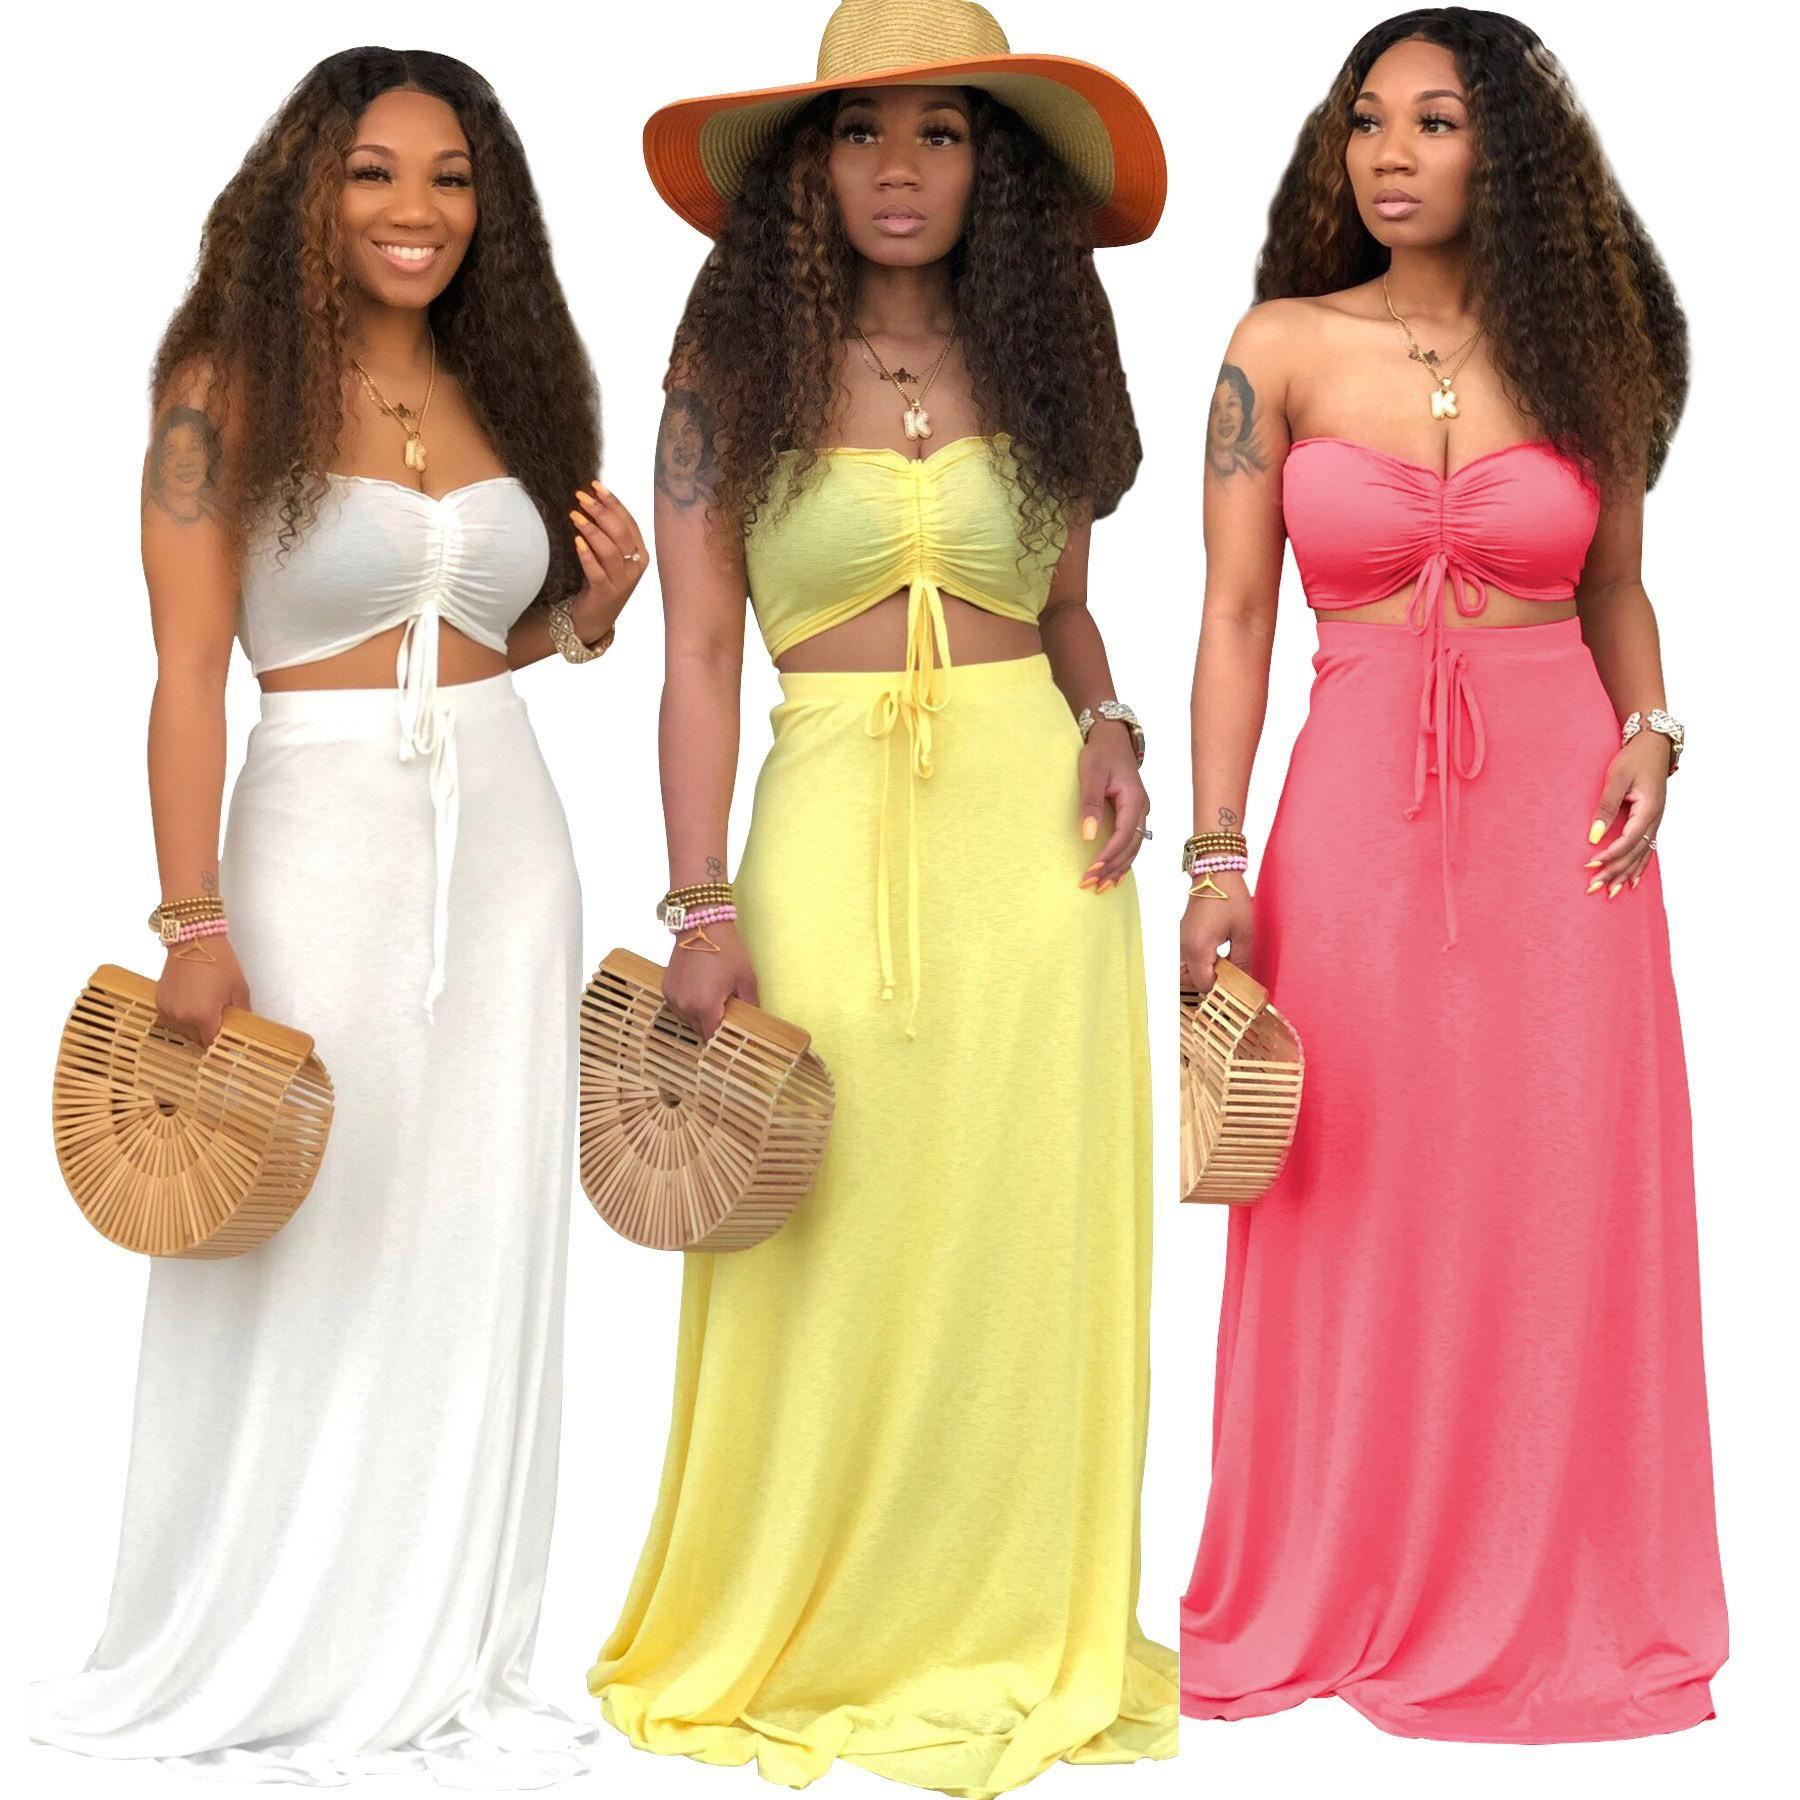 Casual 2 Peça Set Cor Sólida Mulheres Bandage Shorts Tops Colheita + Longo Vestido de Praia Roupas de Treino